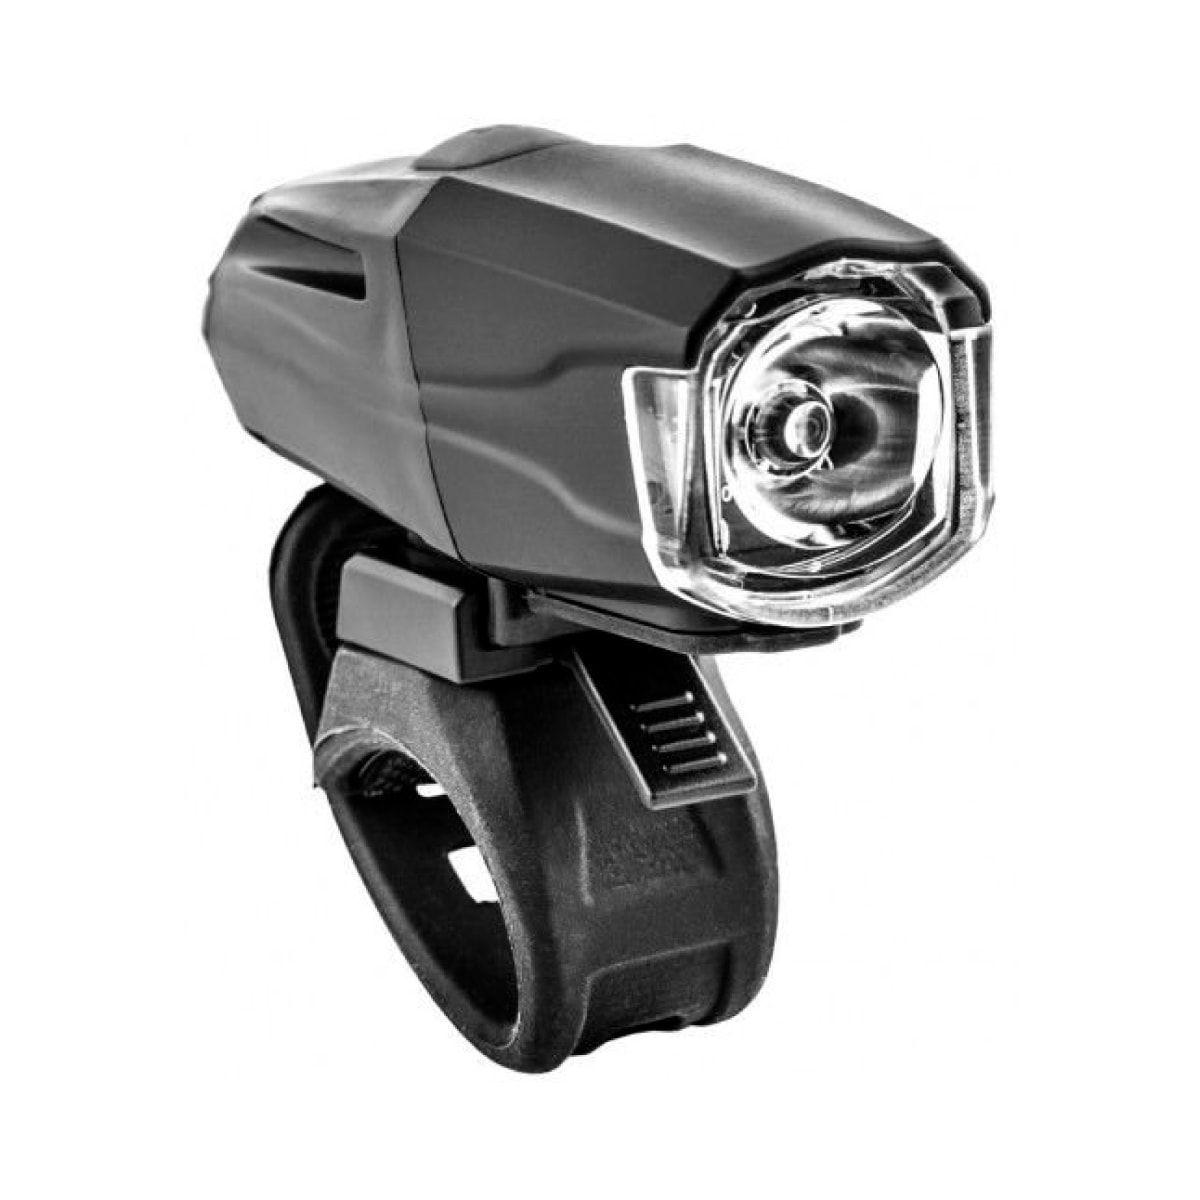 Kit Bike Farol Potente USB + Fitas Anti Furo e Suporte Garrafa